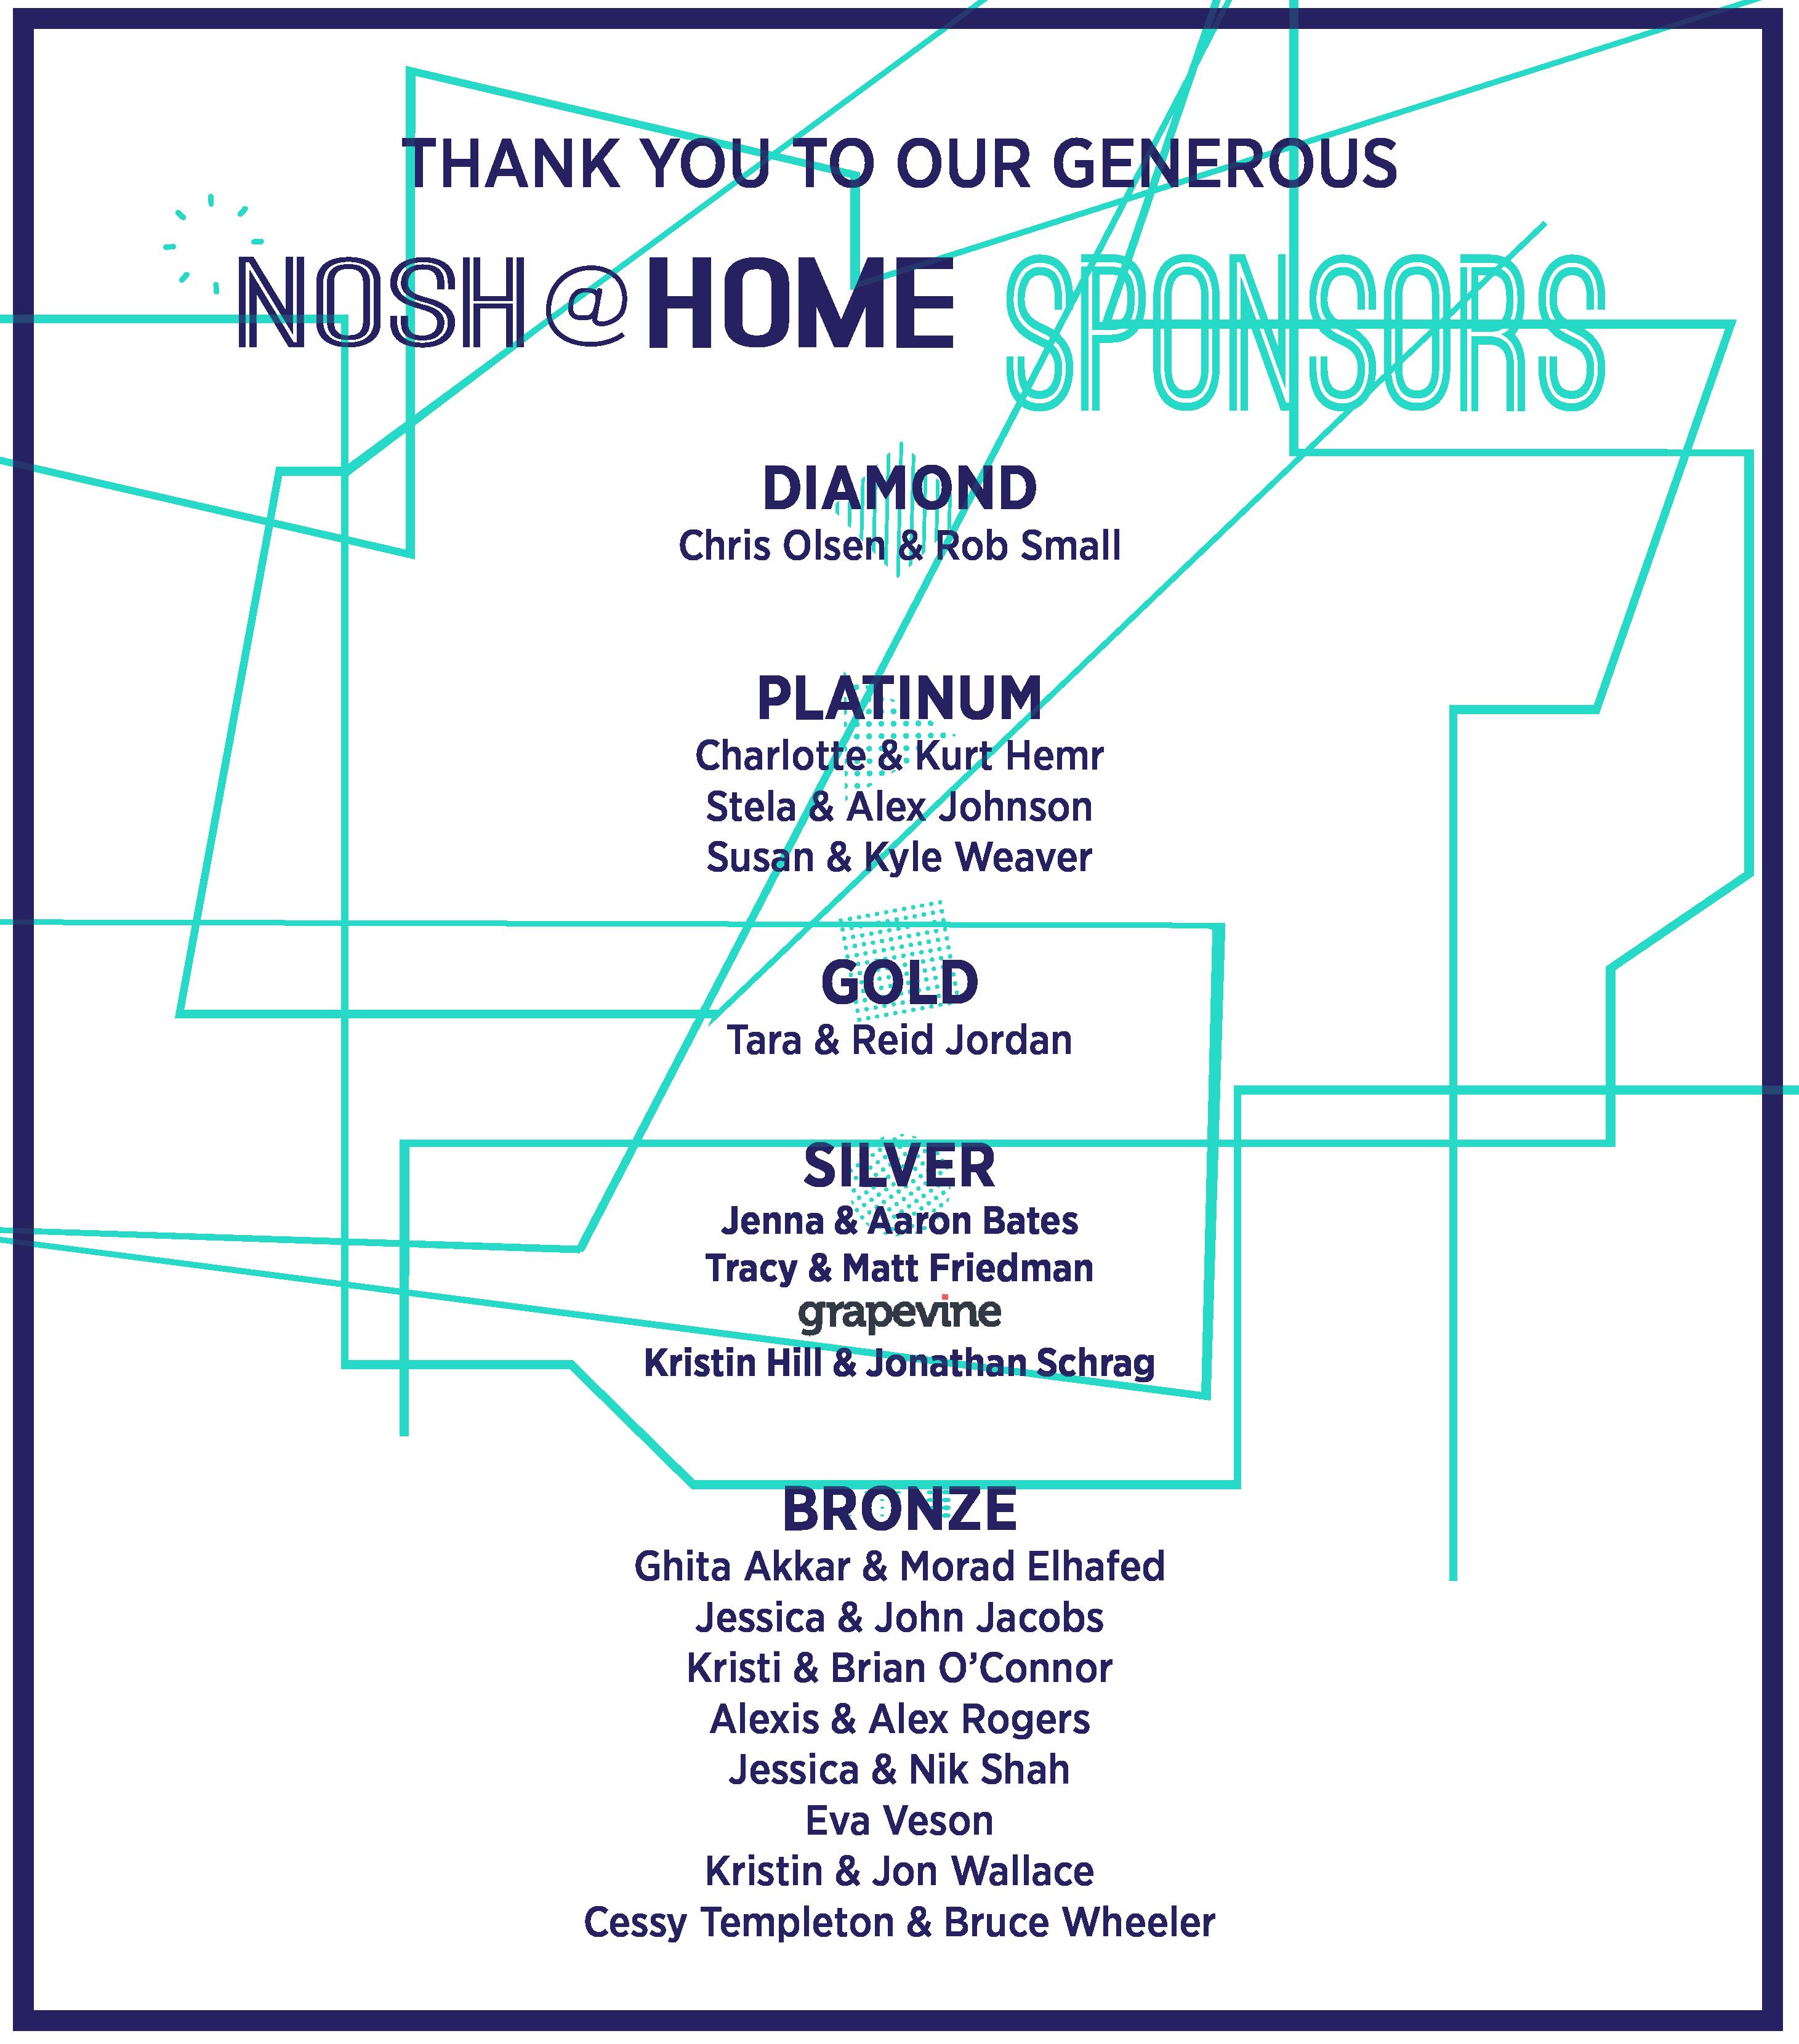 Sponsors as of 4-30 at 1125-33